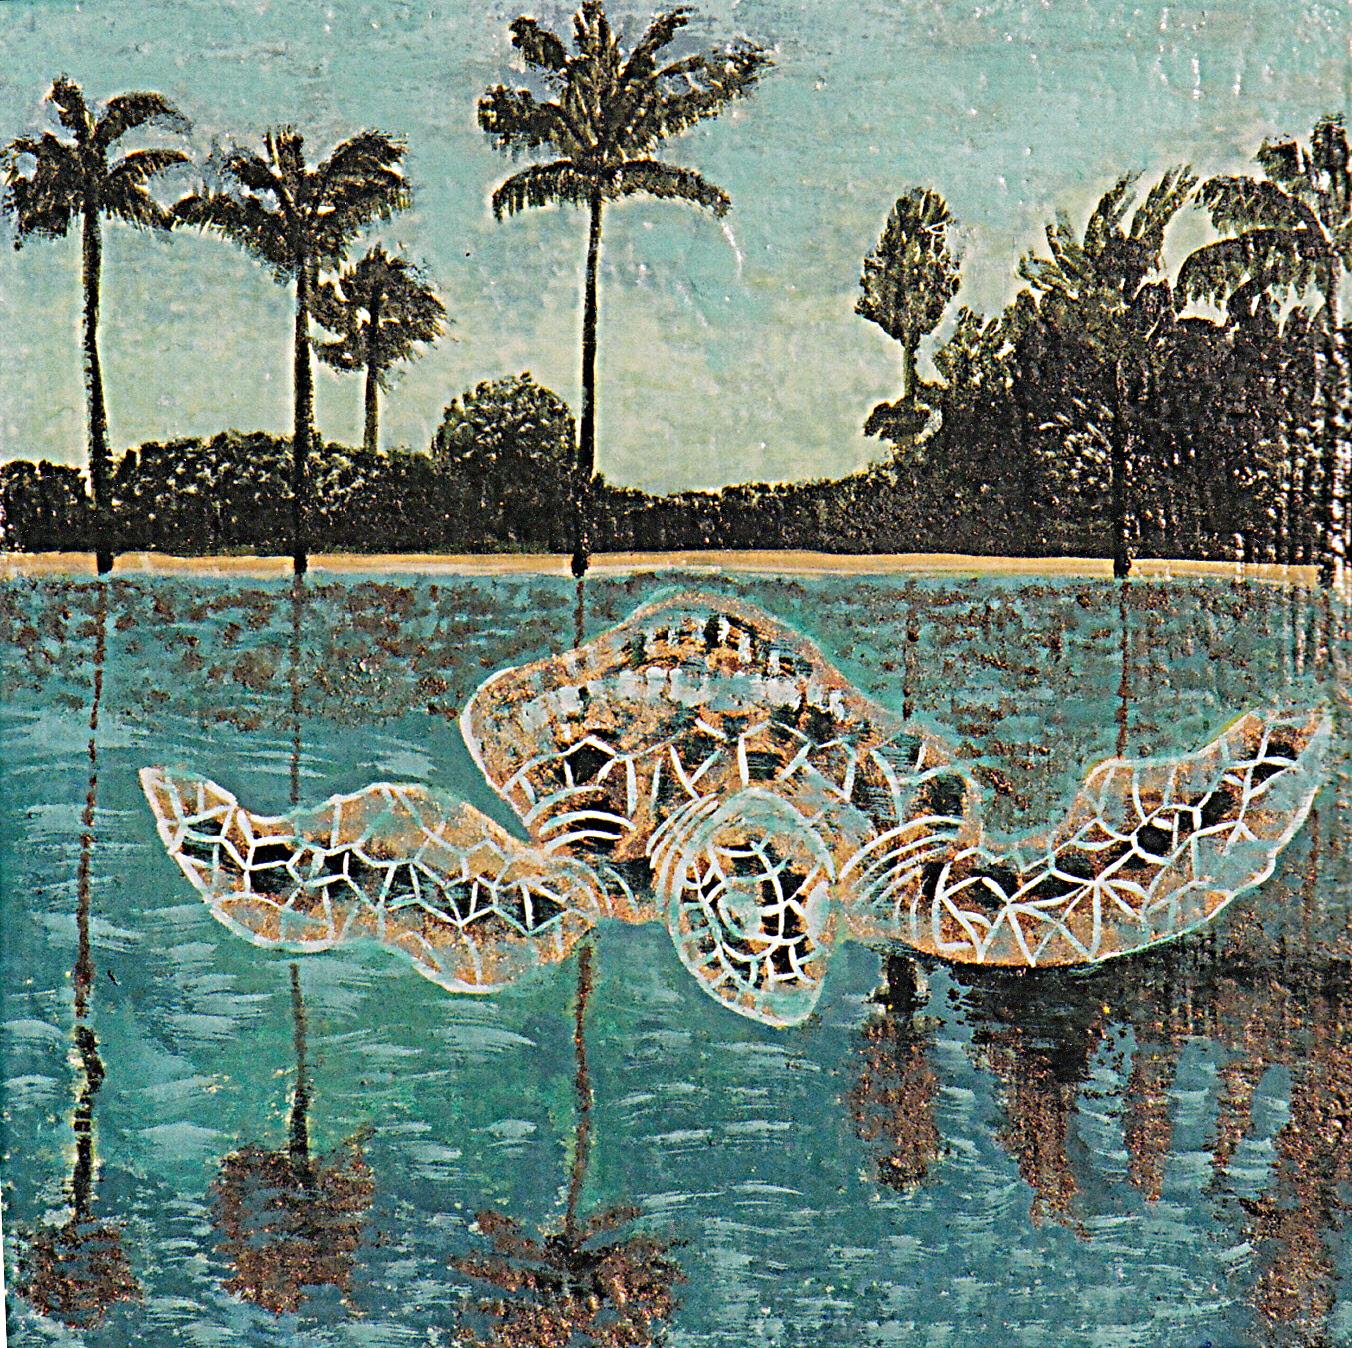 Tortuga in Lake Florida by Eliza M Schmid